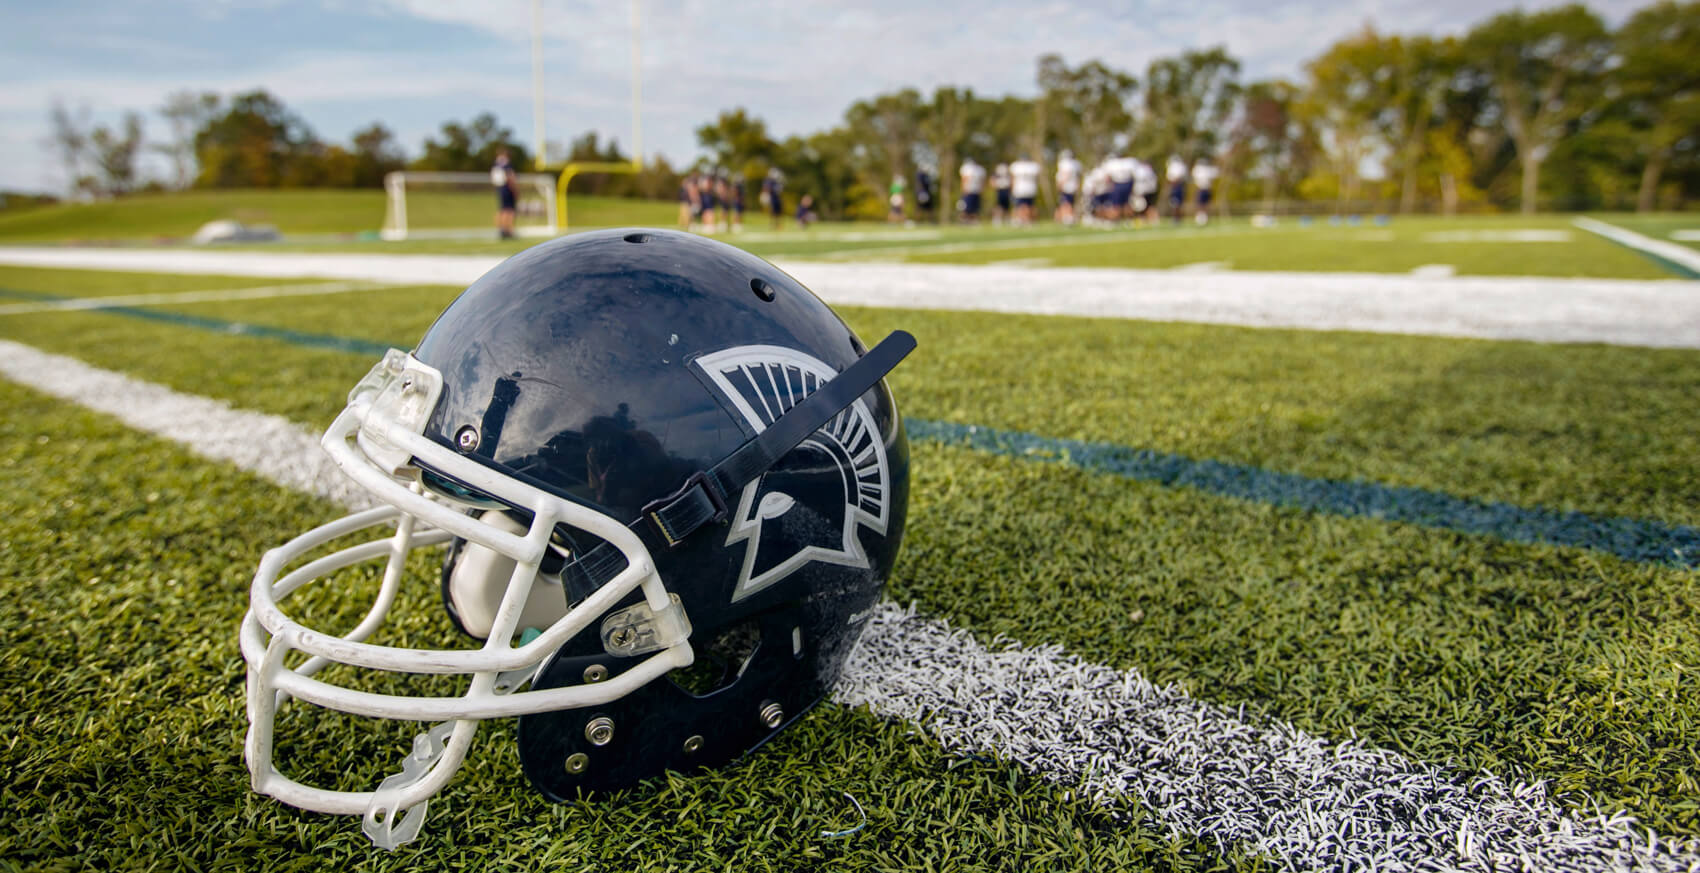 MBU Spartans helmet upright on a football field